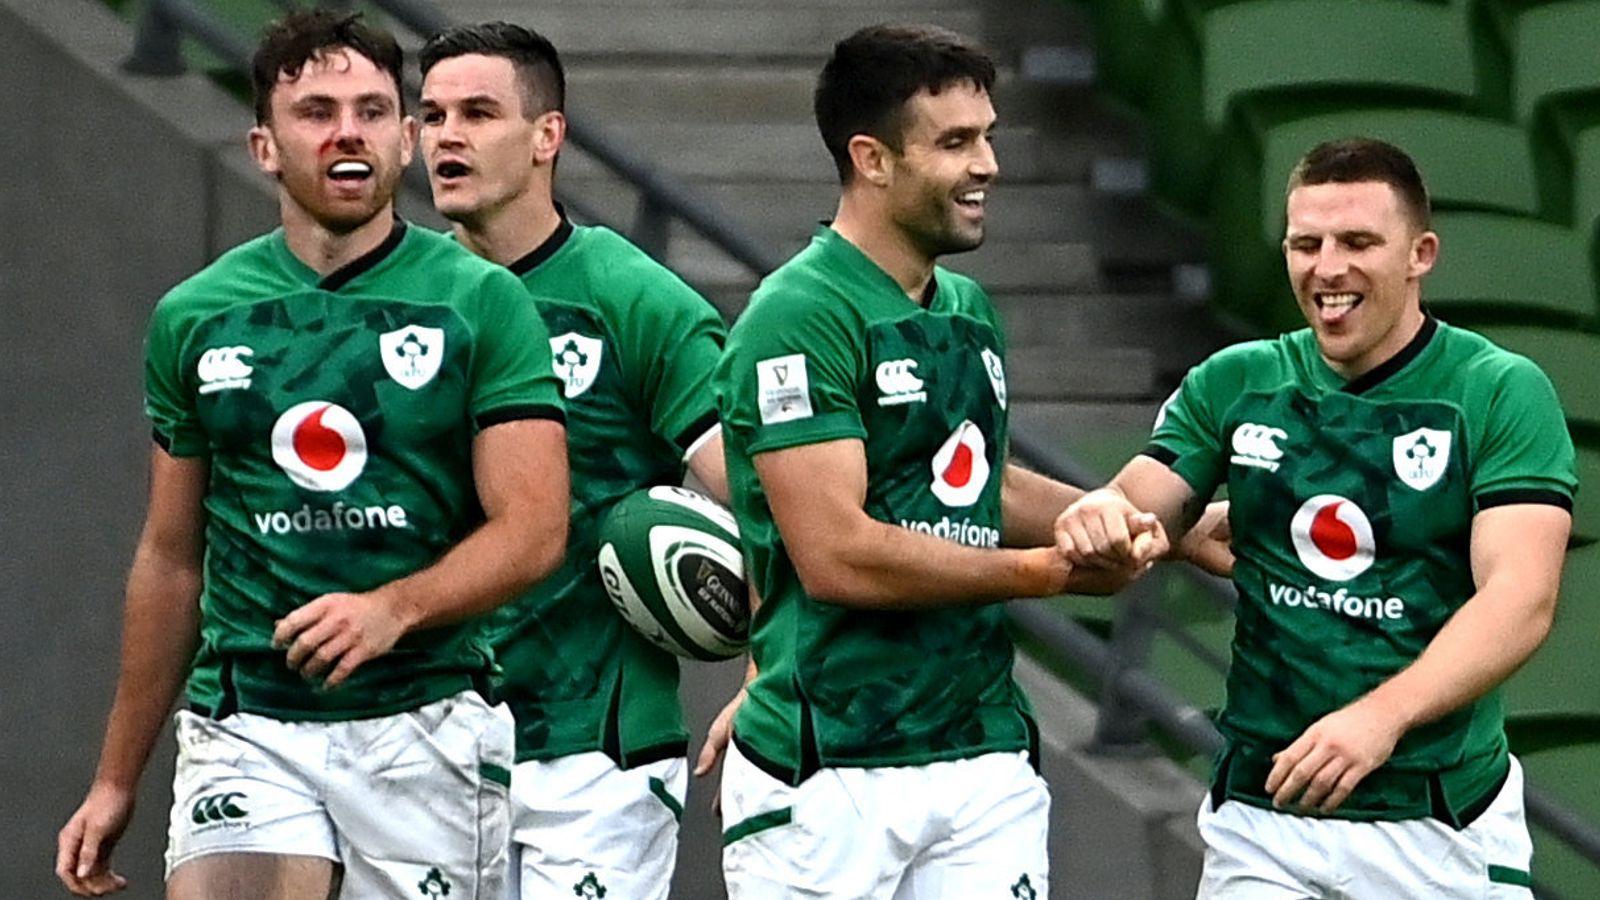 Ireland to host autumn internationals against New Zealand, Argentina and Japan